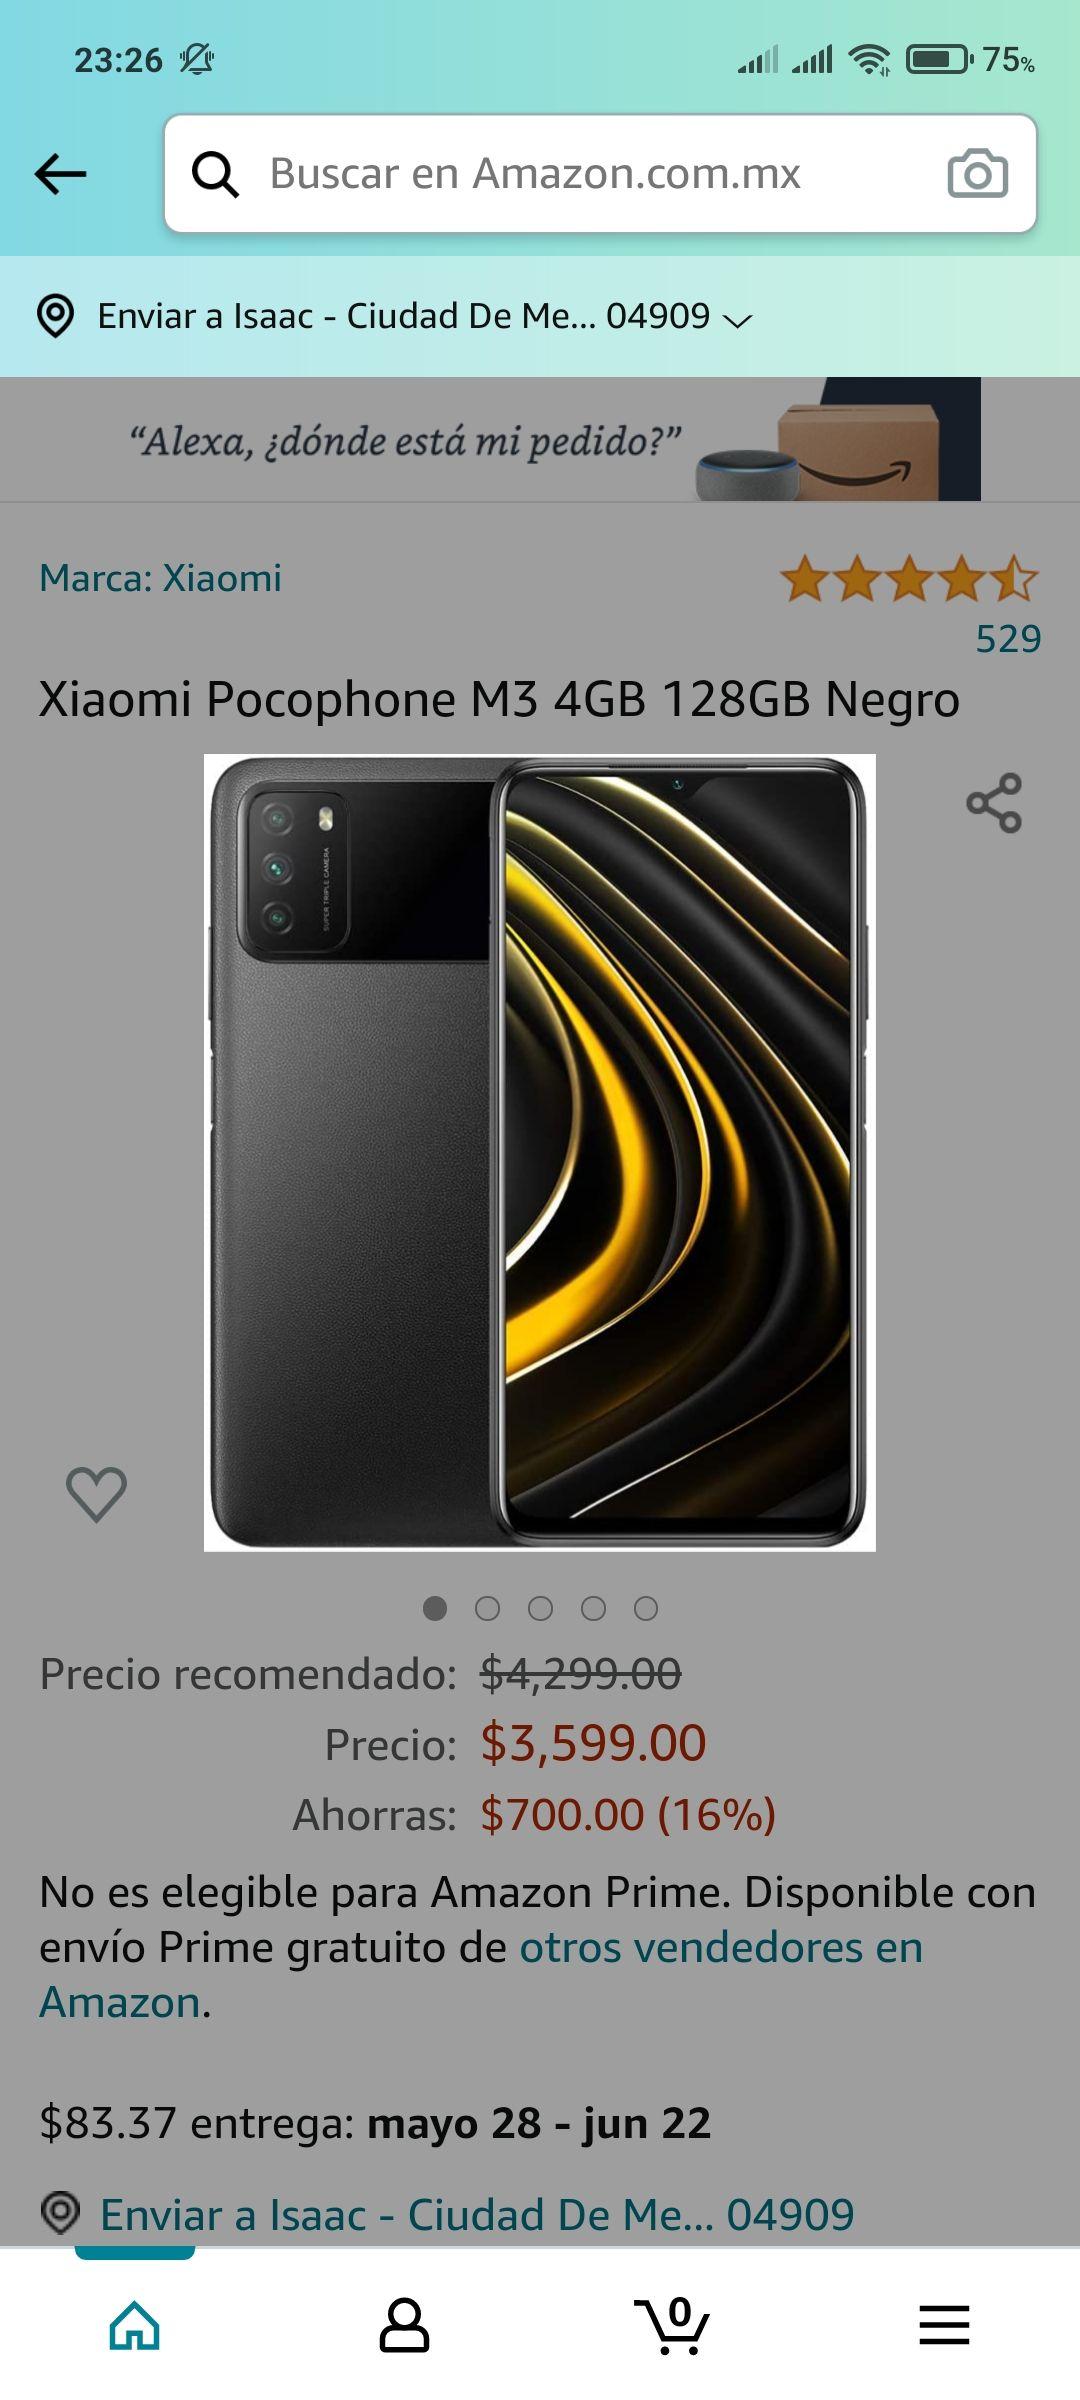 Amazon: Xiaomi Pocophone M3 4GB 128GB Negro